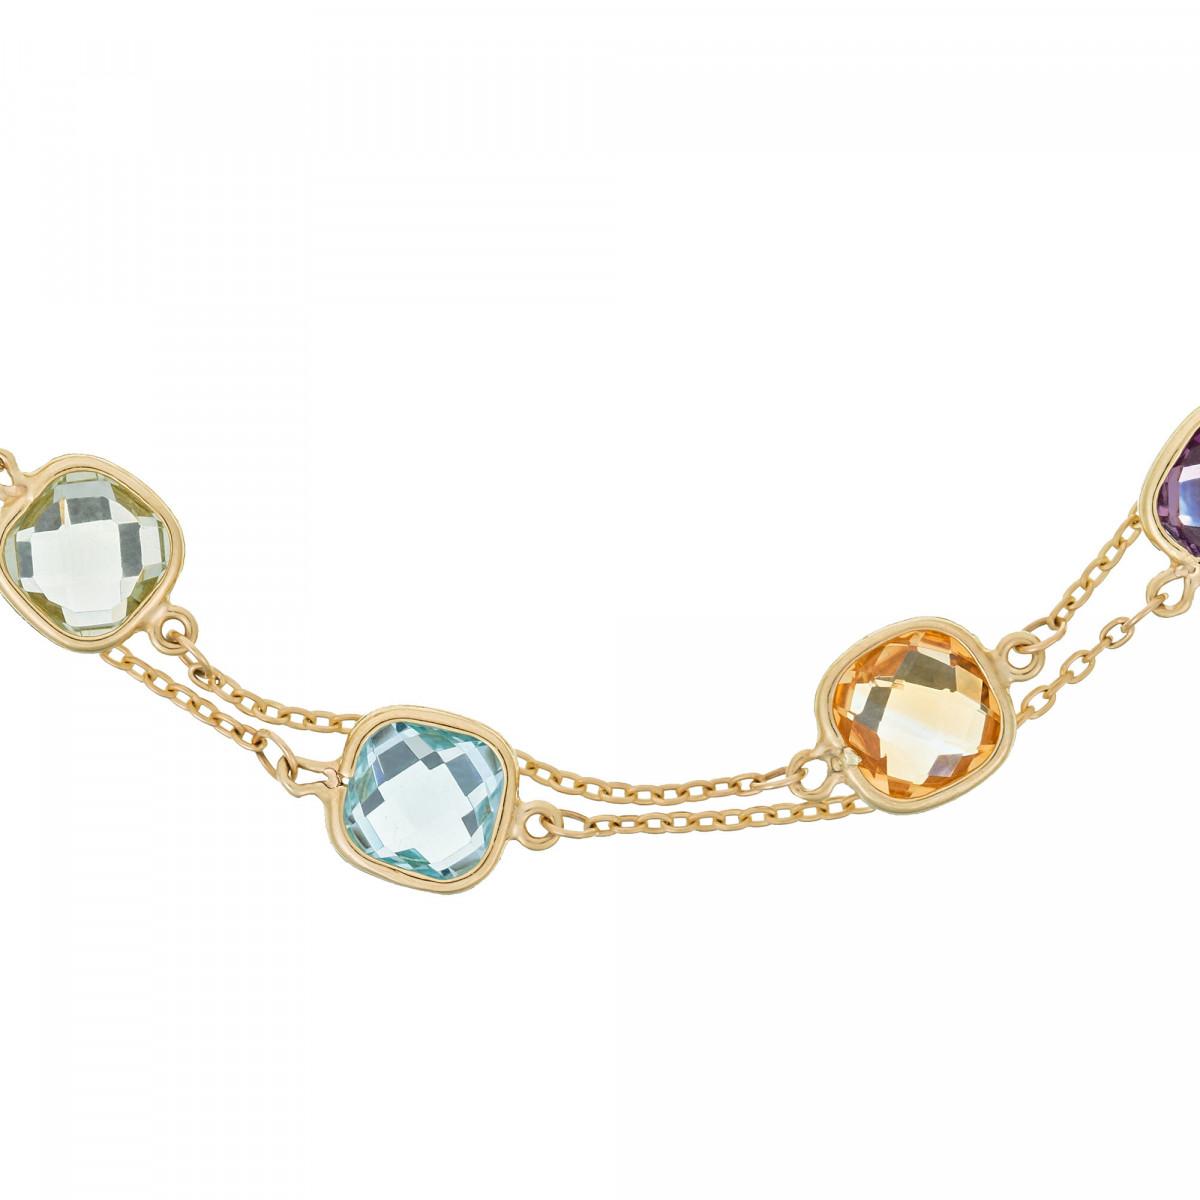 Bracelet Or Jaune 375/1000 et Pierres Fines